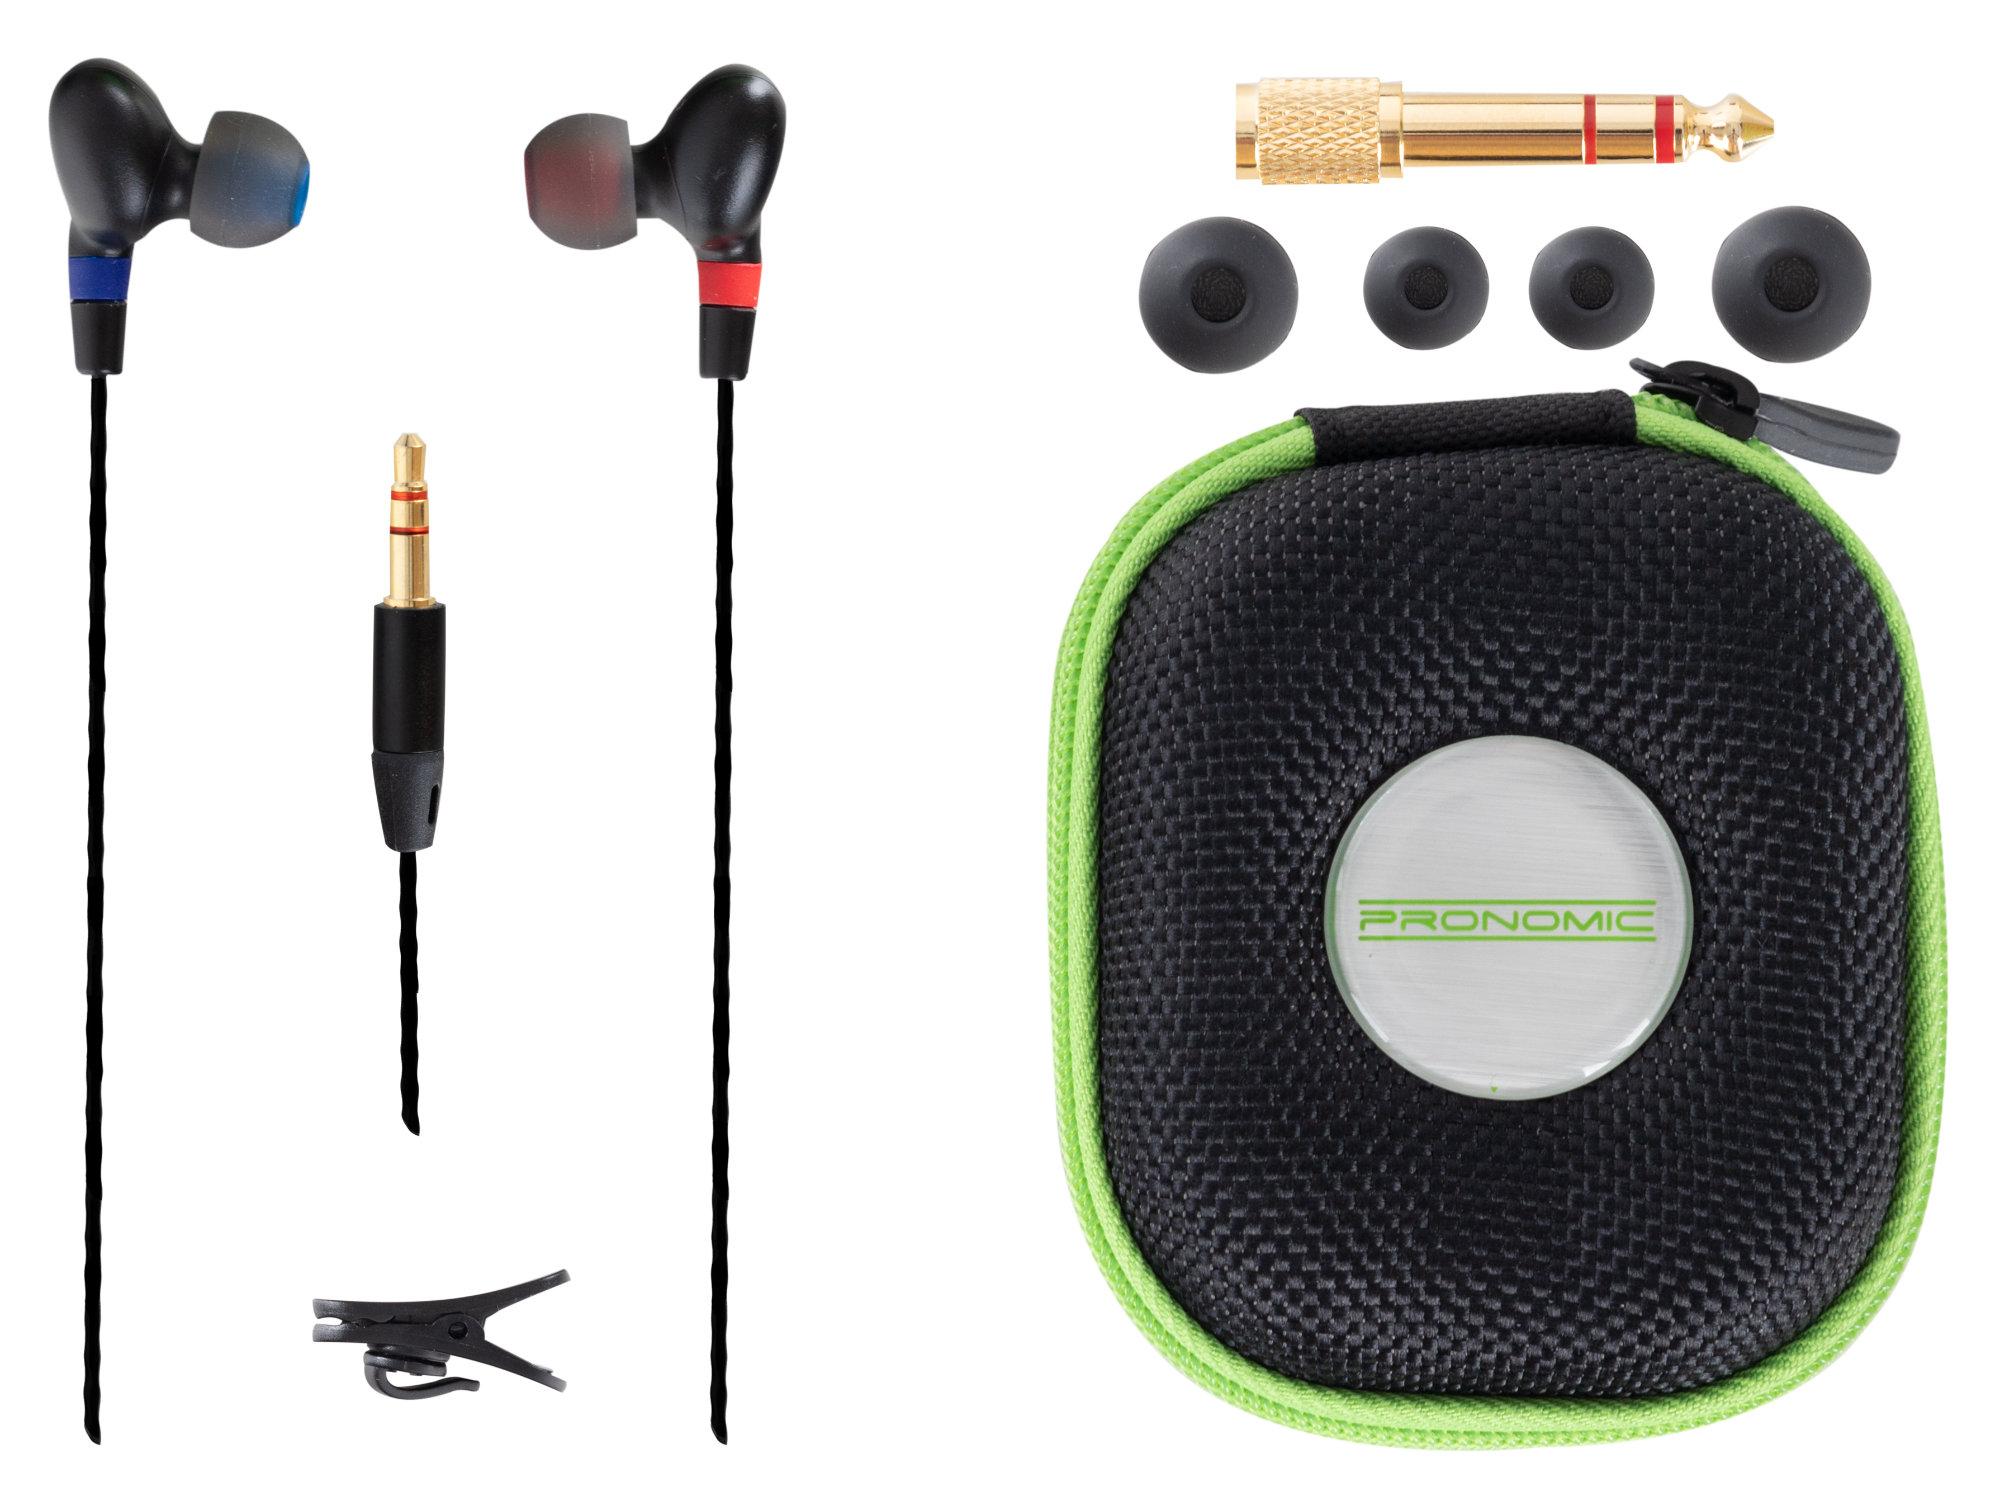 Kopfhoerer - Pronomic iPH 115 In Ear Kopfhörer 1,5m - Onlineshop Musikhaus Kirstein